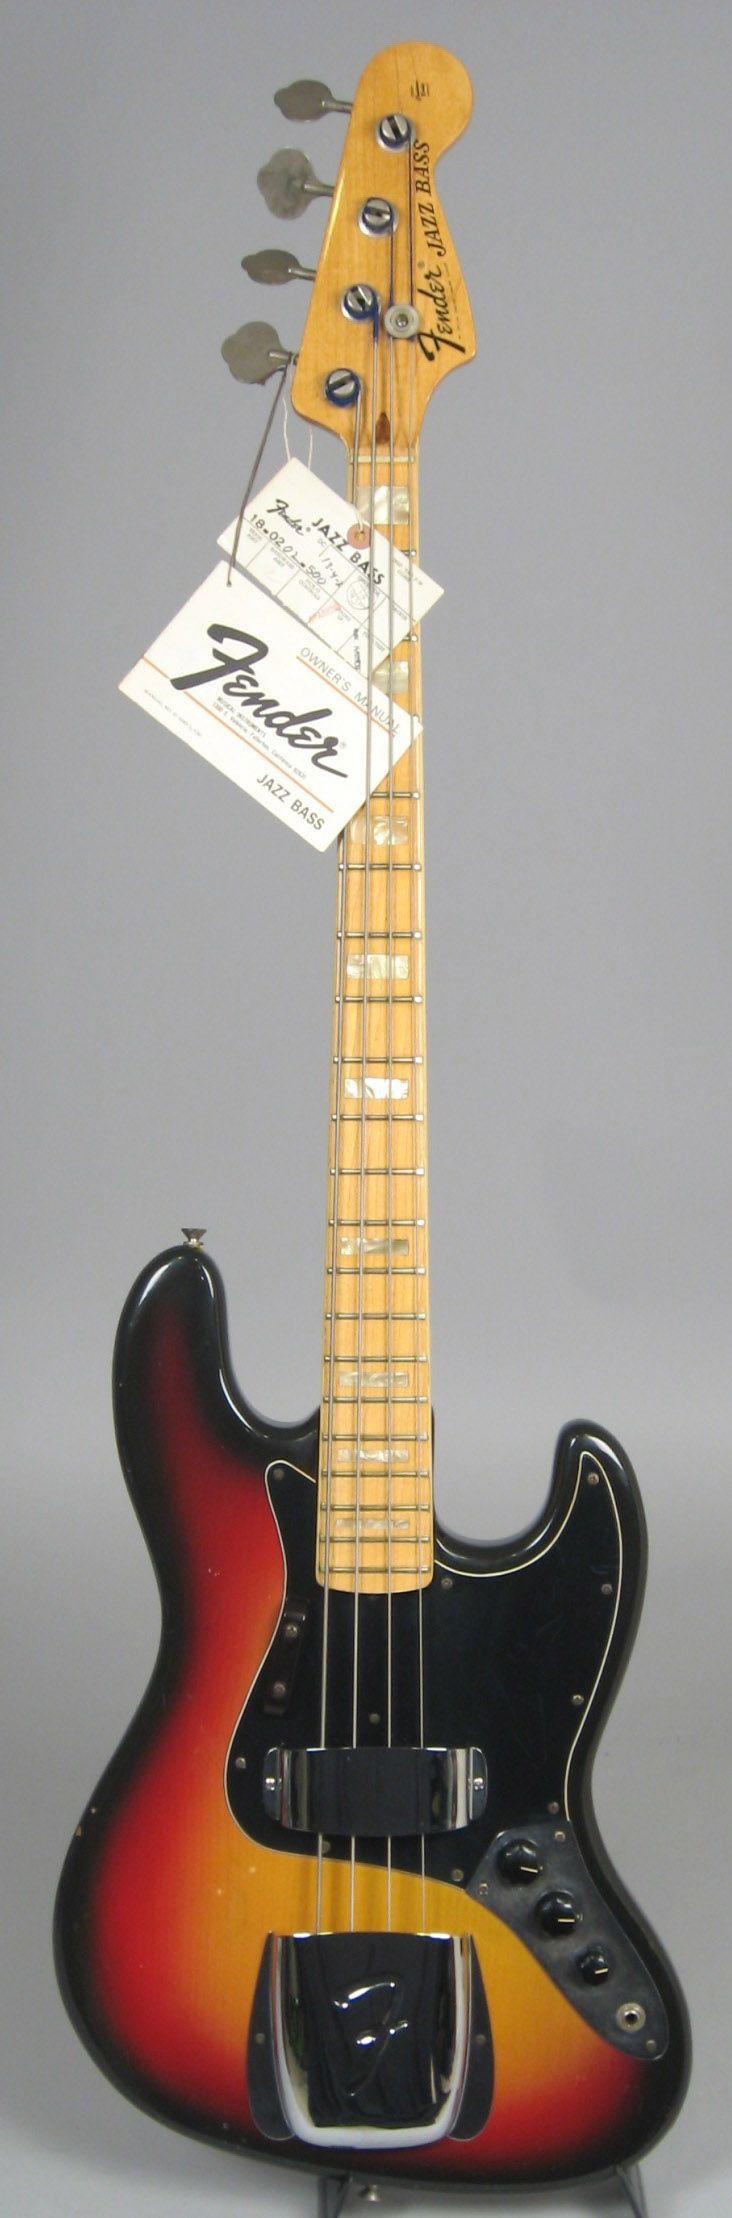 1974 fender jazz bass